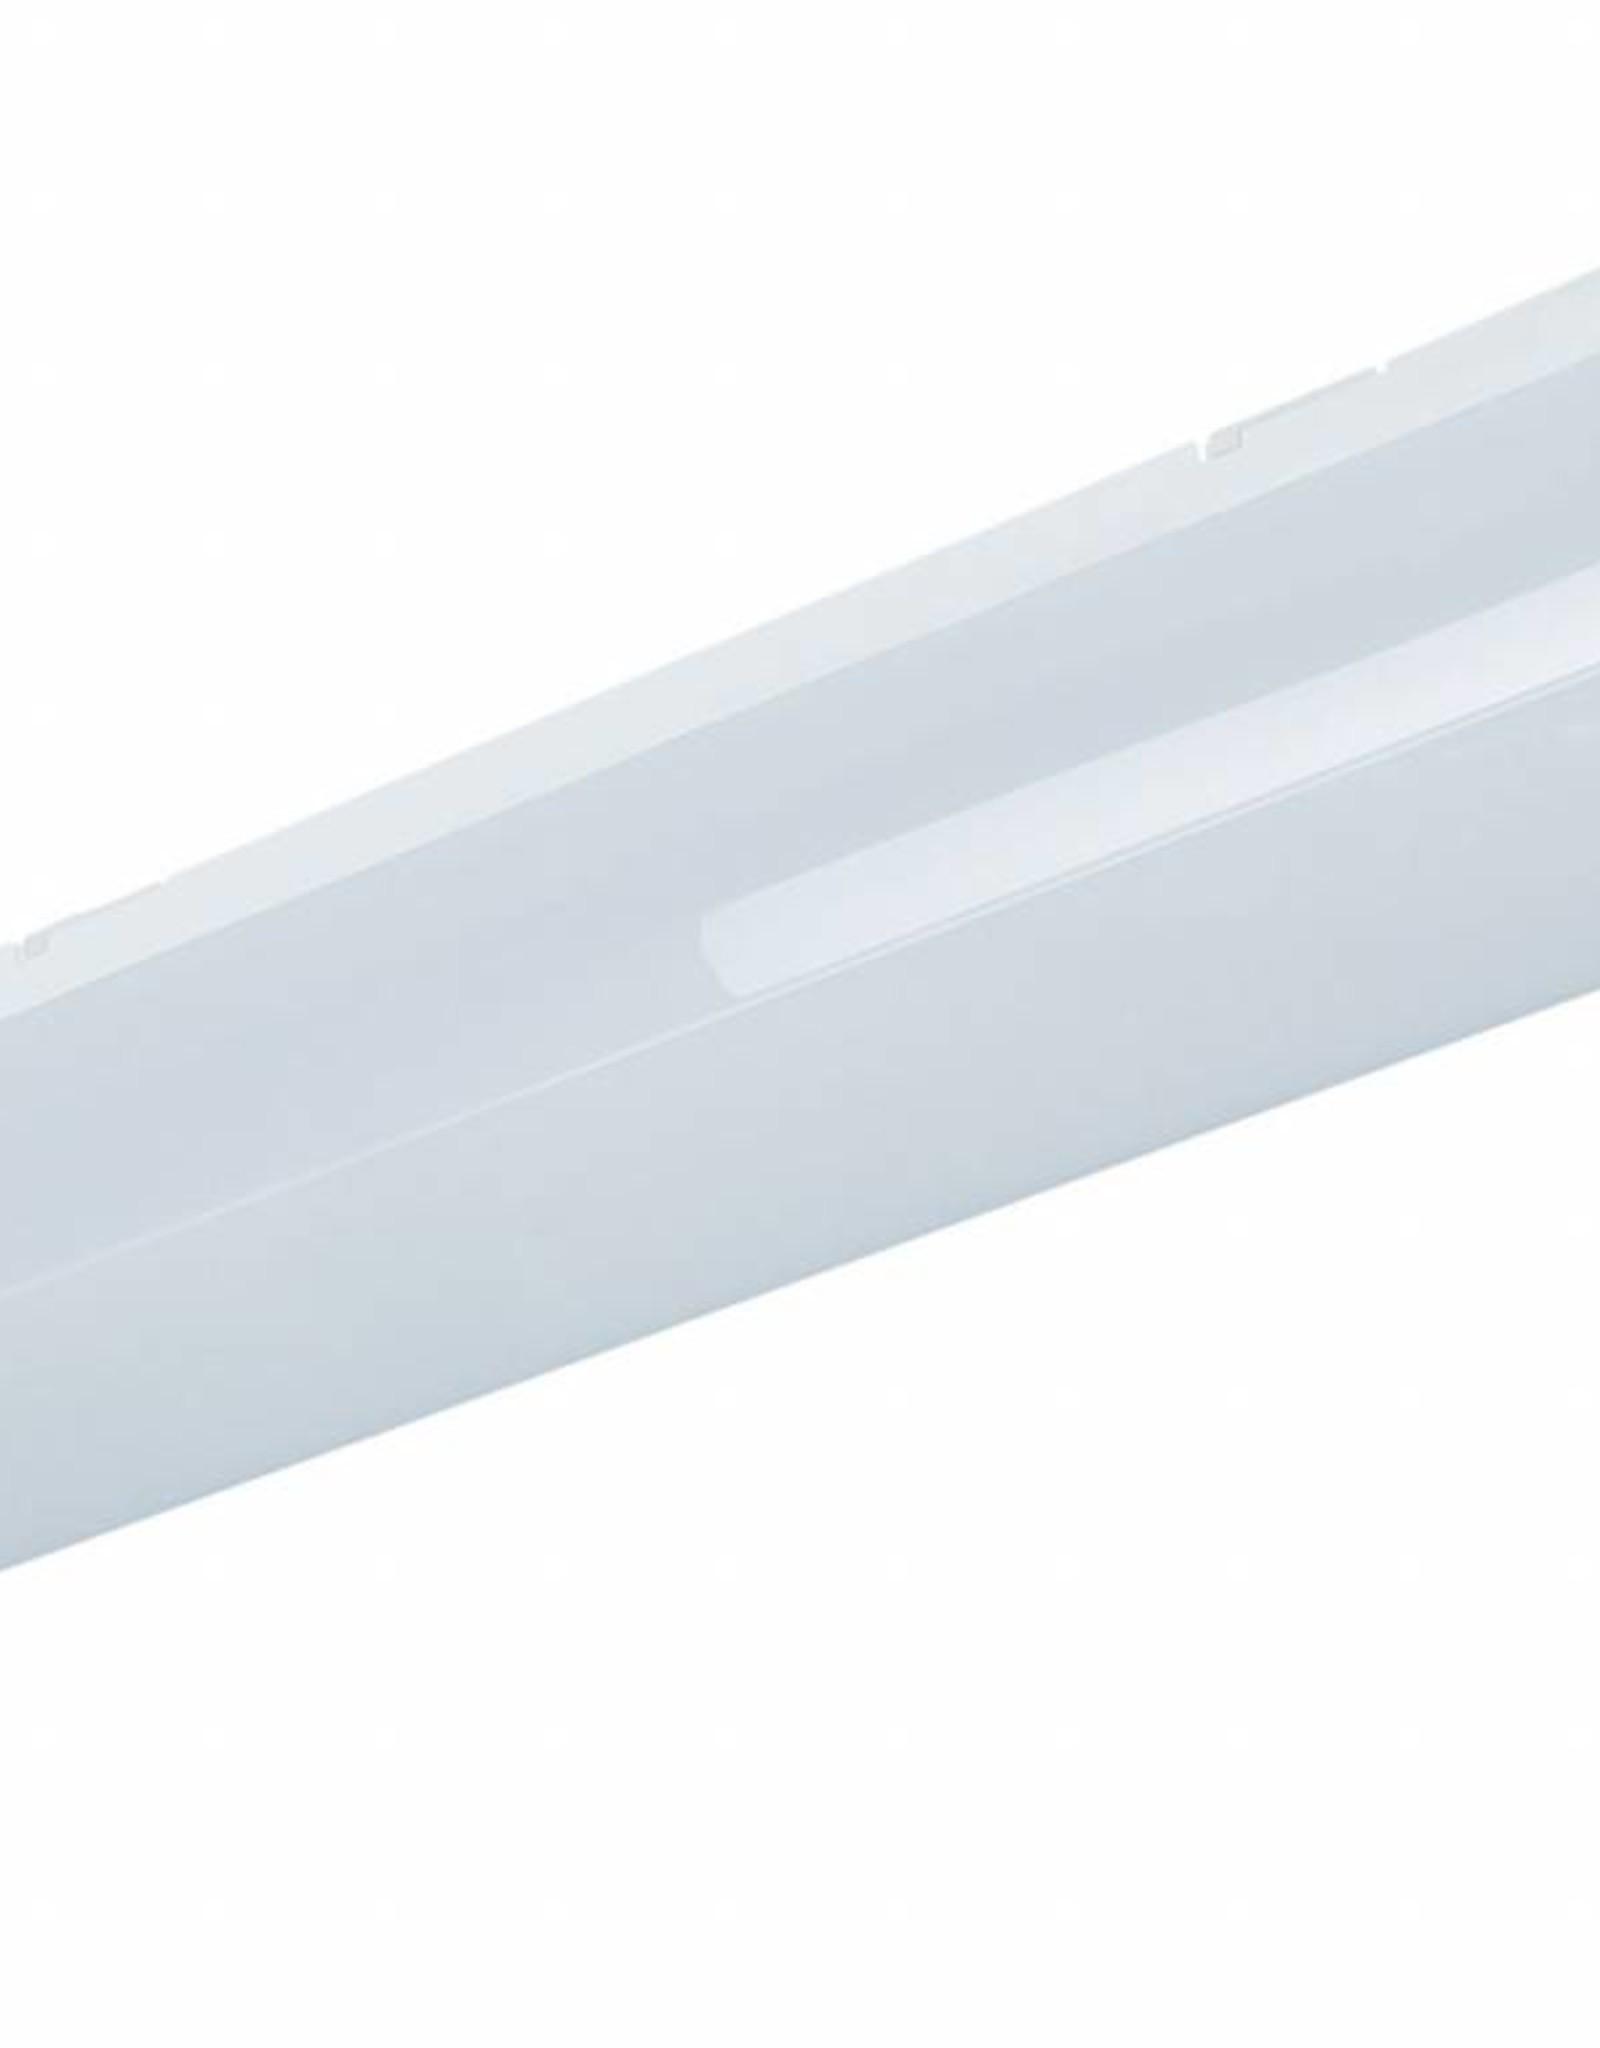 Linea 2.4ft 6400/840 DALI M1h